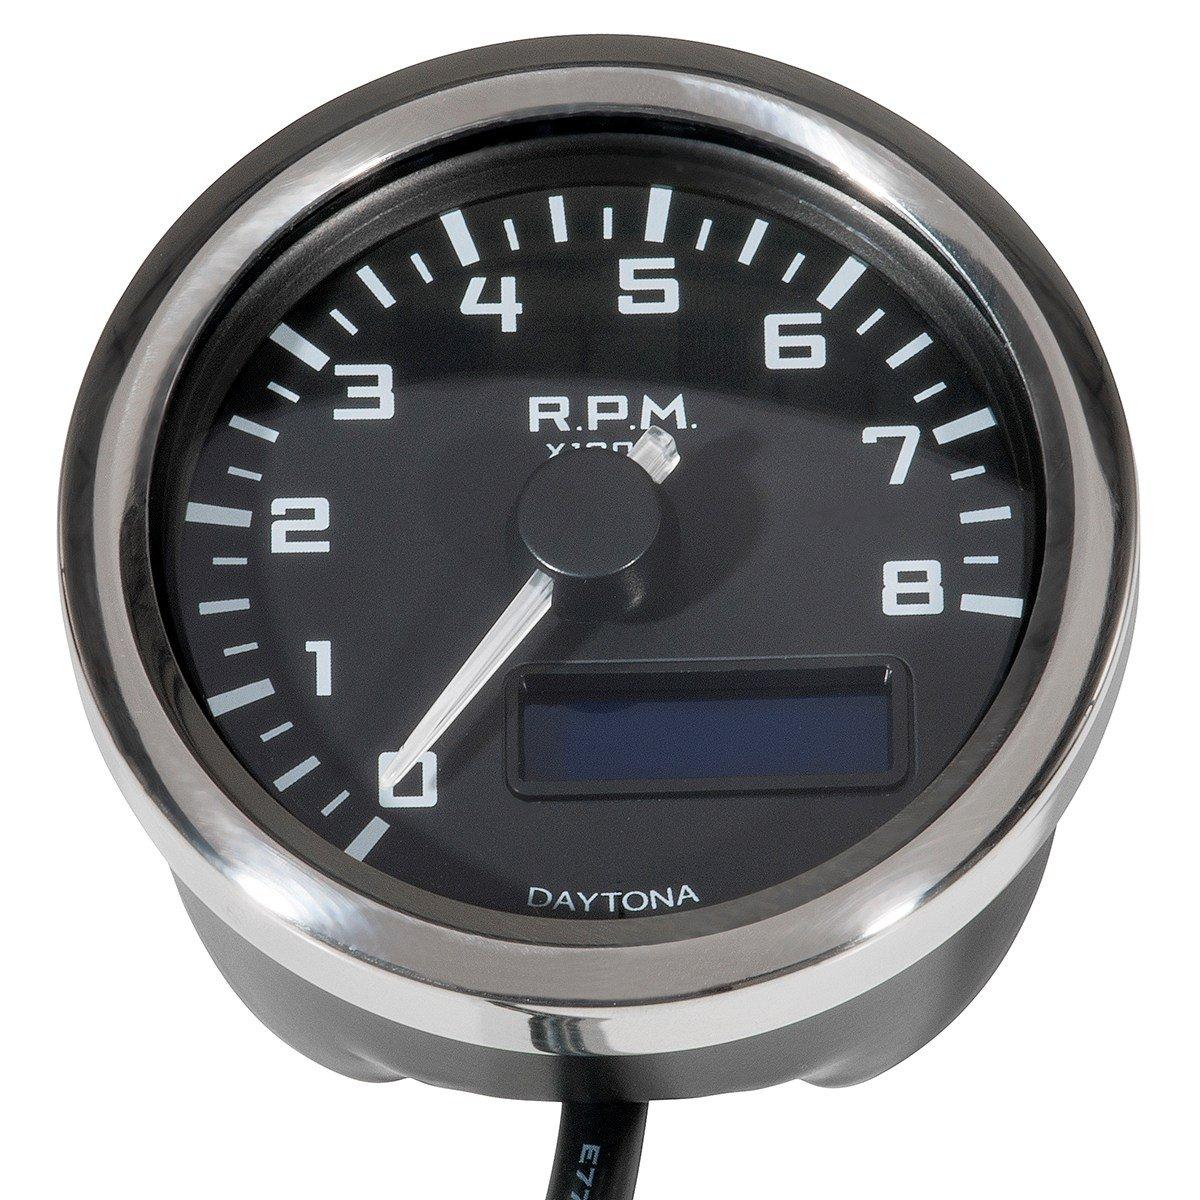 Yamaha Bolt R Spec 2014 2016 Tachometer Kit By Daytona Instruments Speedo Wiring Diagram Dbyacc561316 Automotive